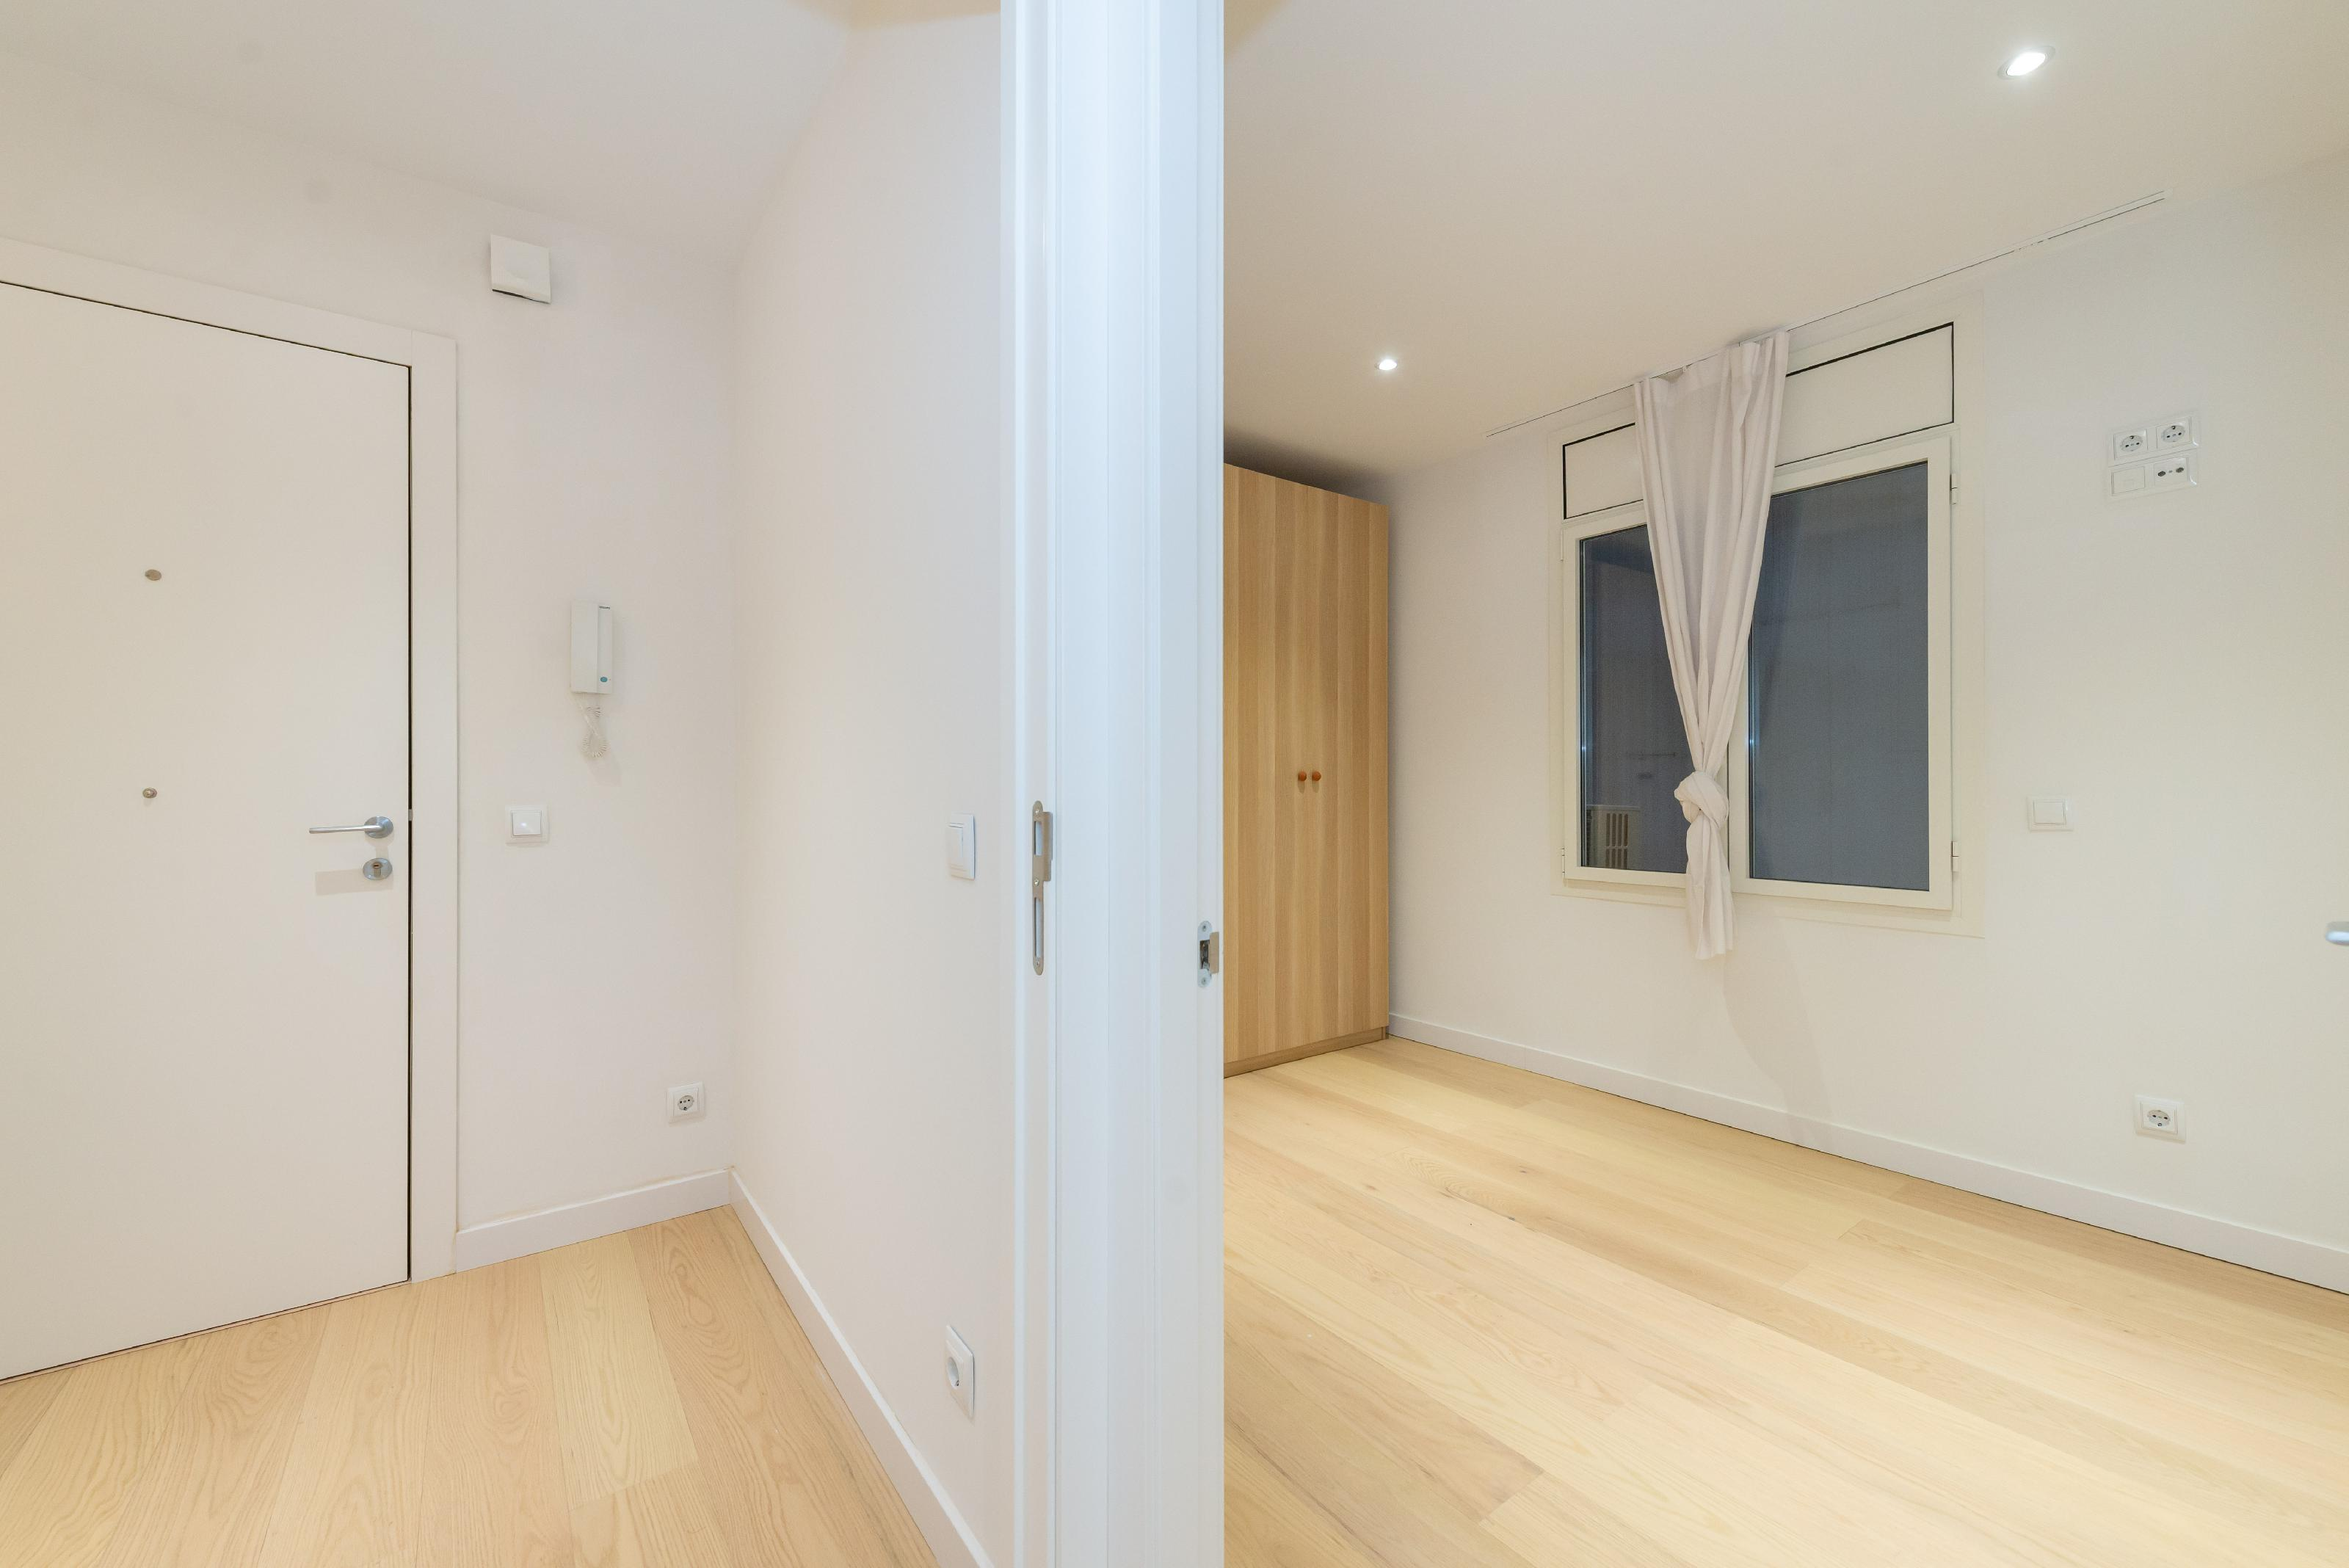 245231 Flat for sale in Sarrià-Sant Gervasi, Sant Gervasi-Galvany 11